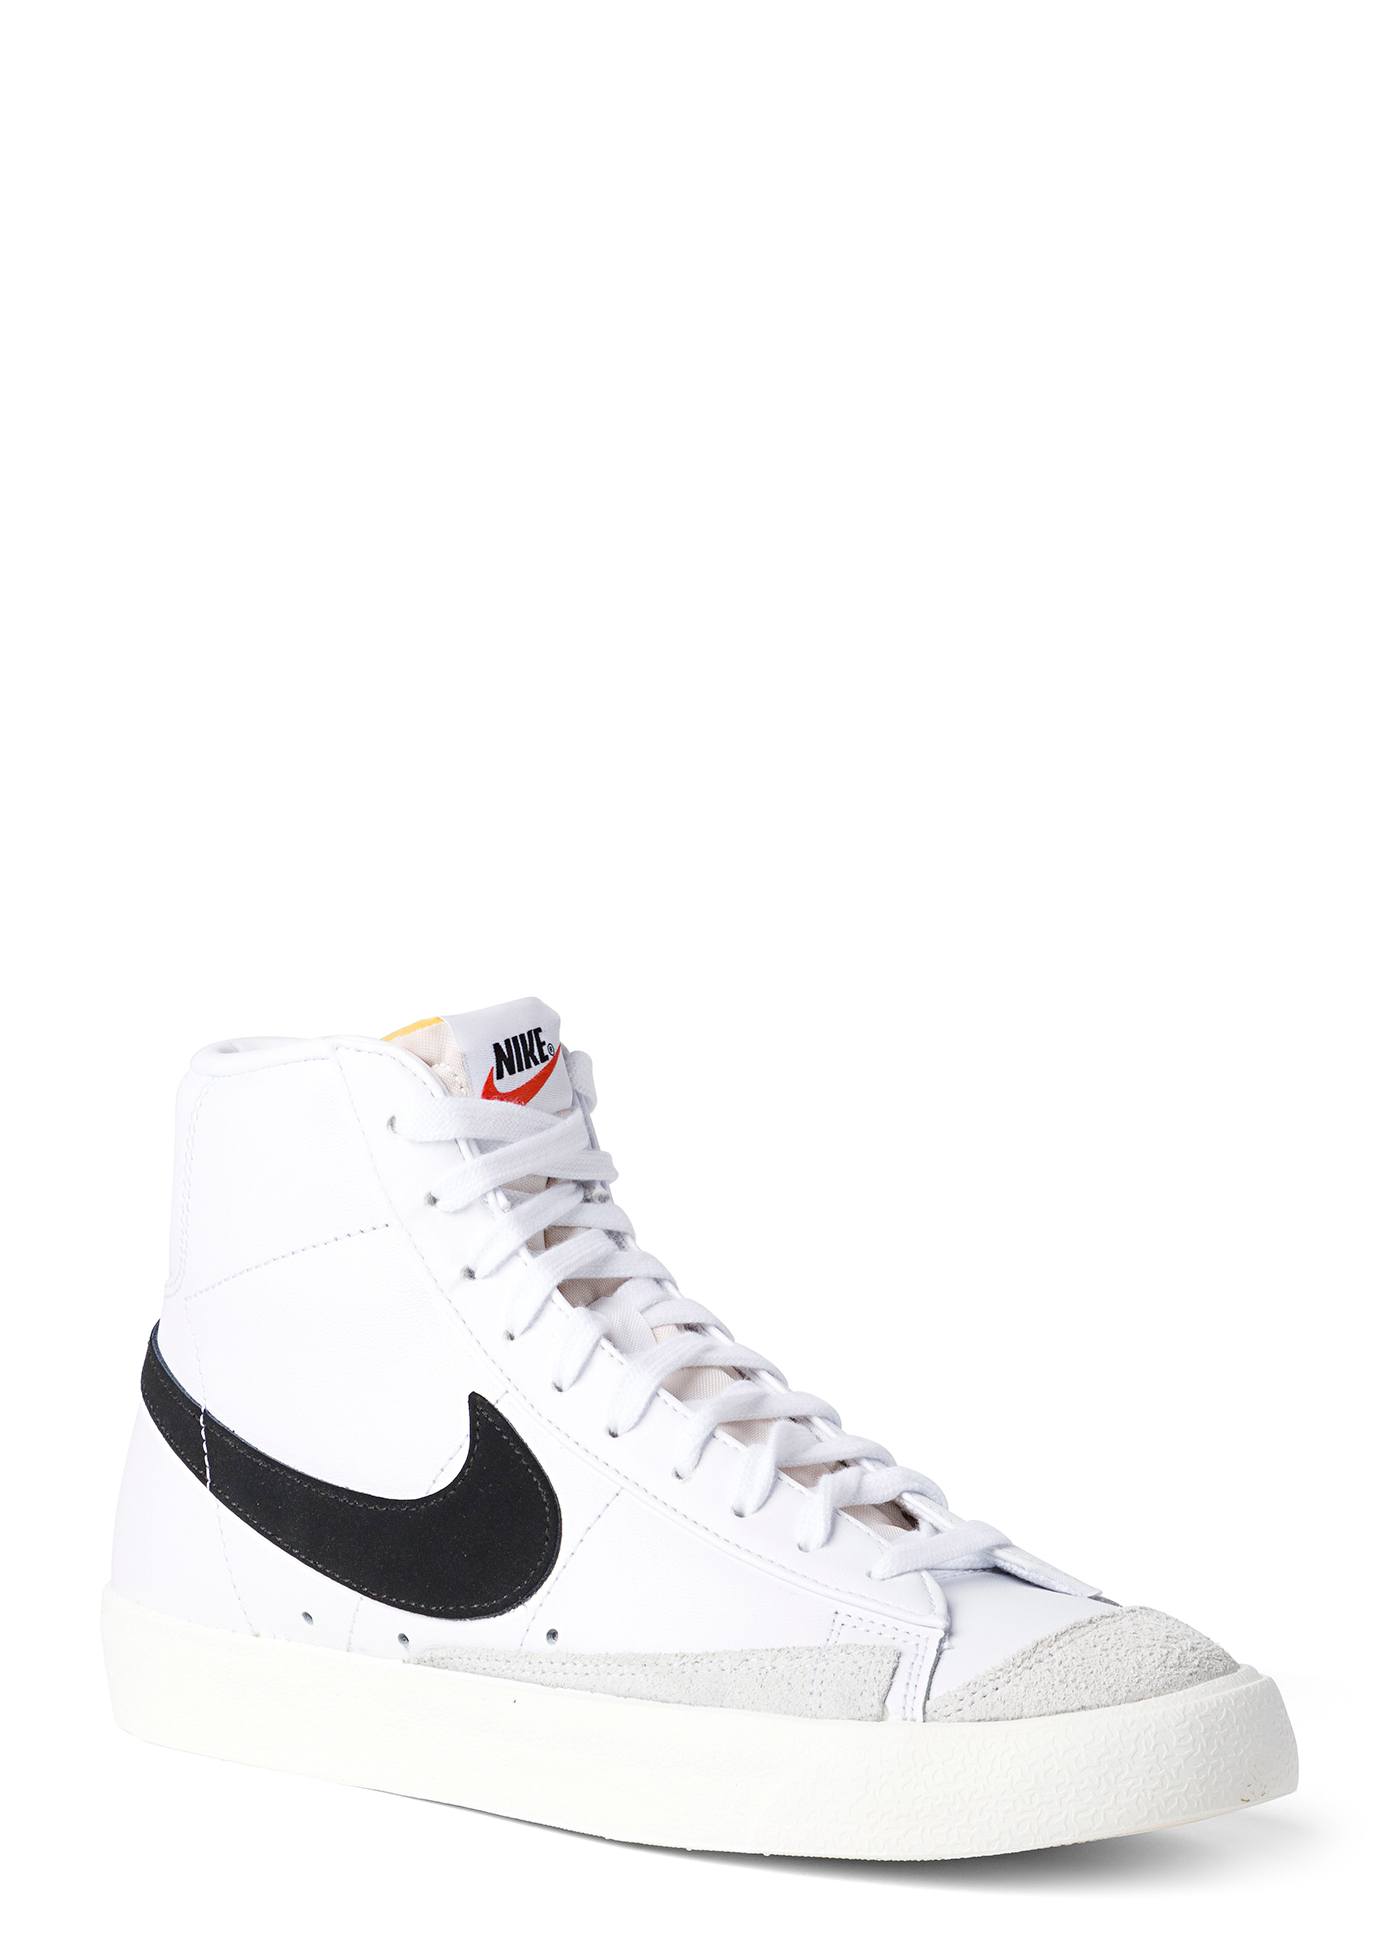 Nike Blazer Mid '77 Vintage image number 1